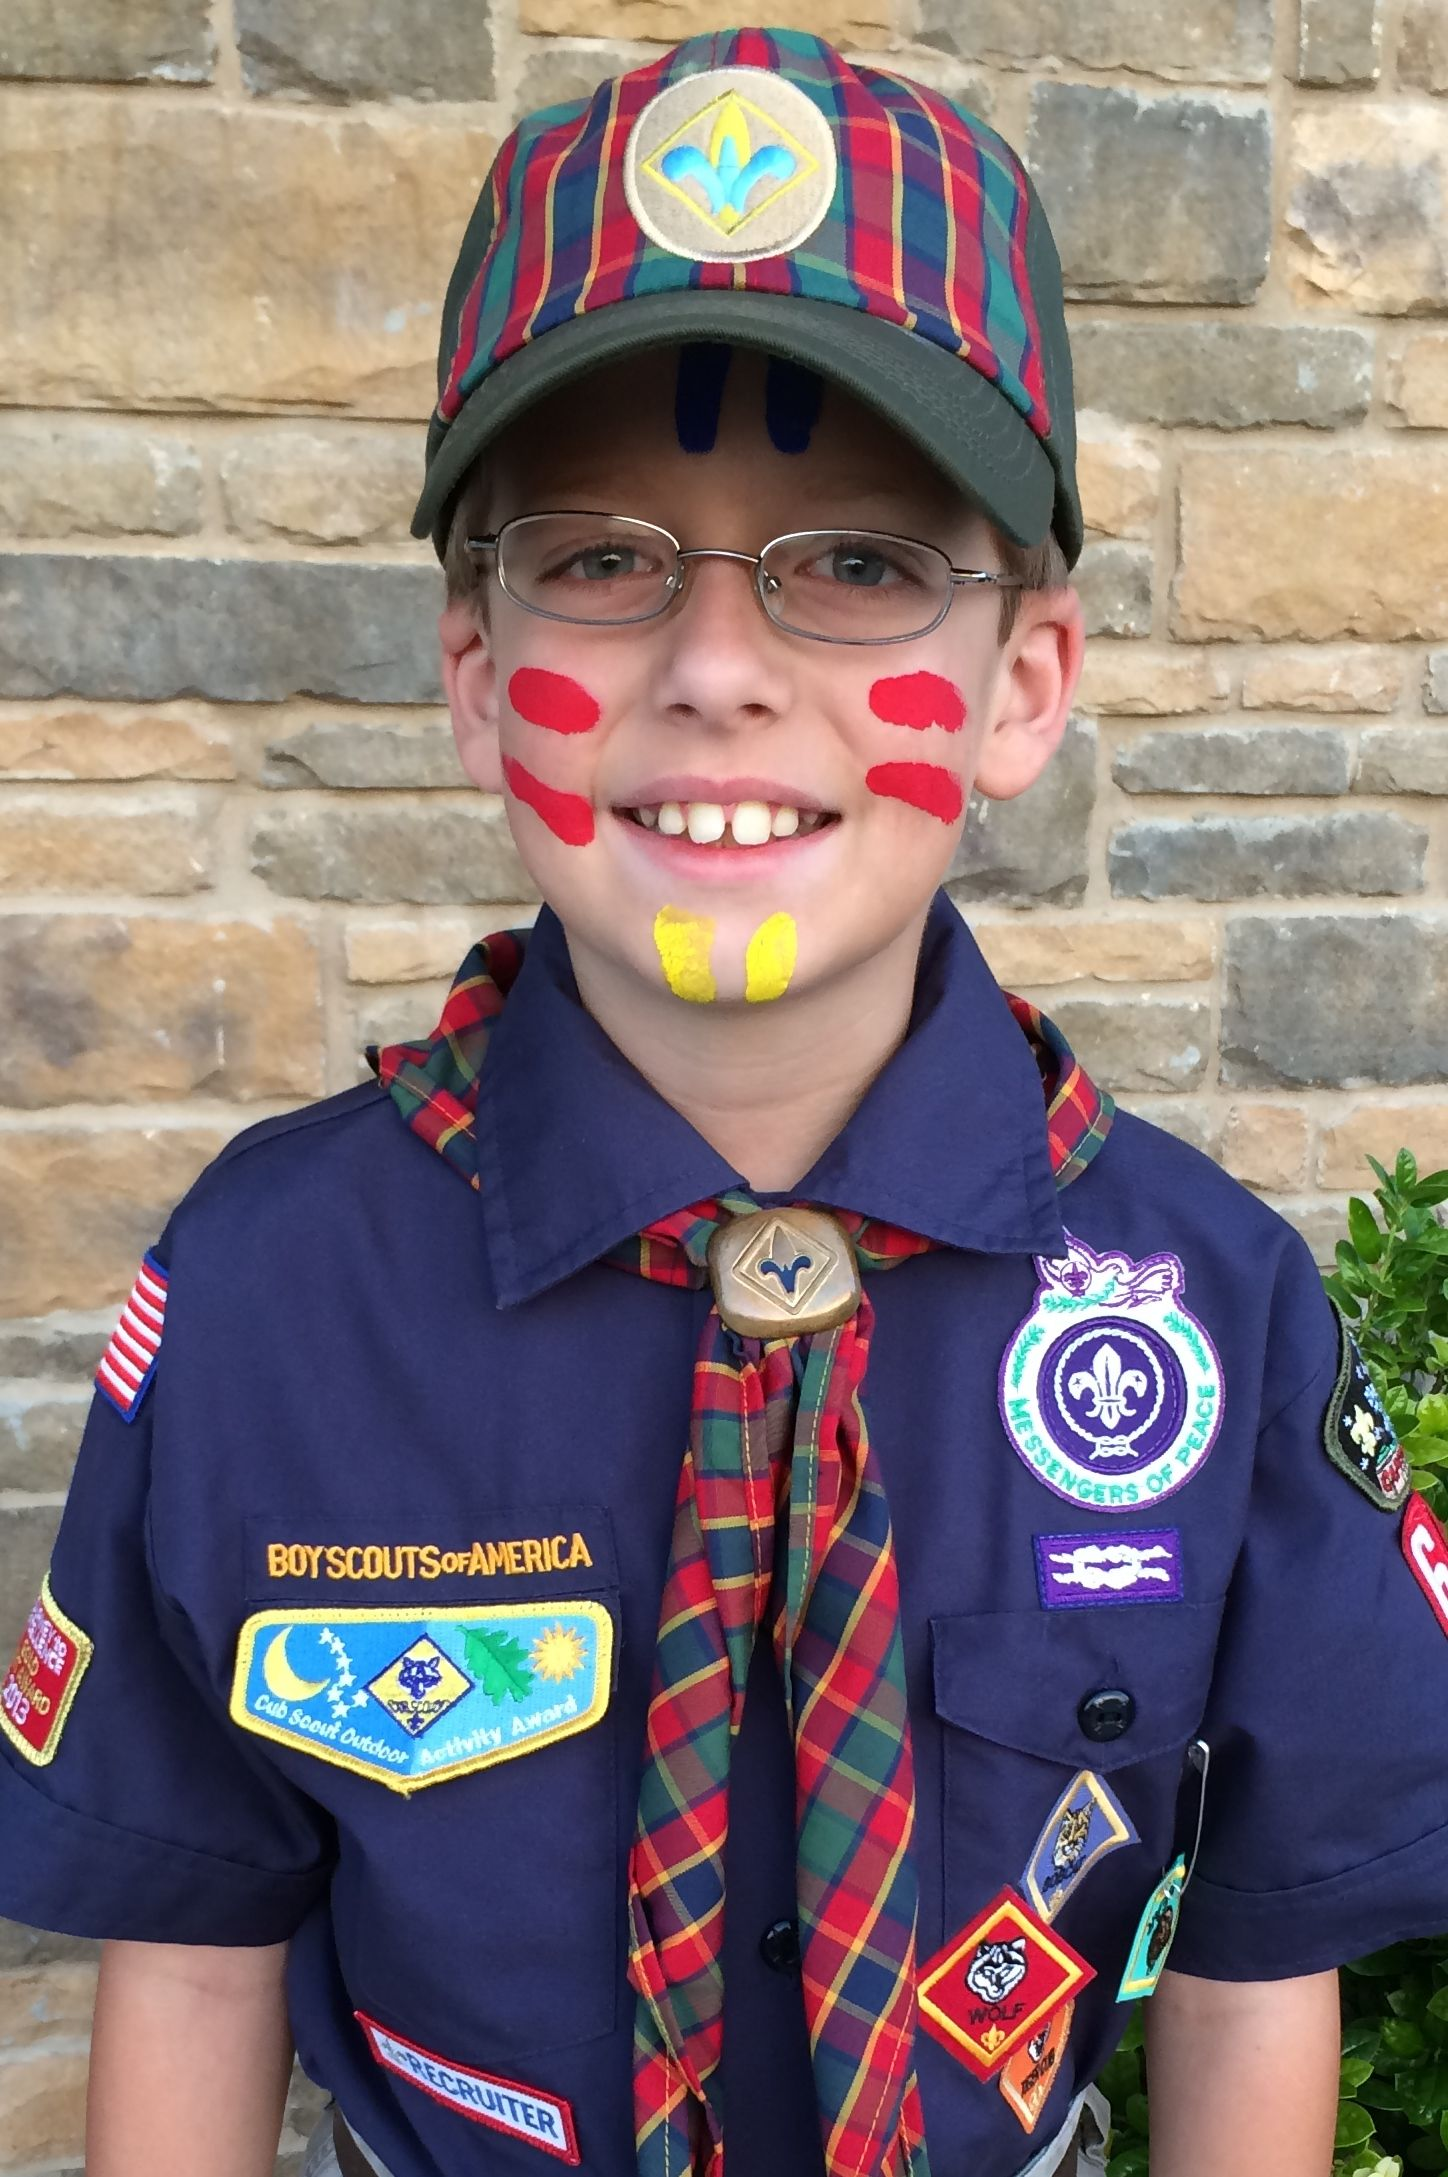 Cub Scout Rank Advancement Face Painting